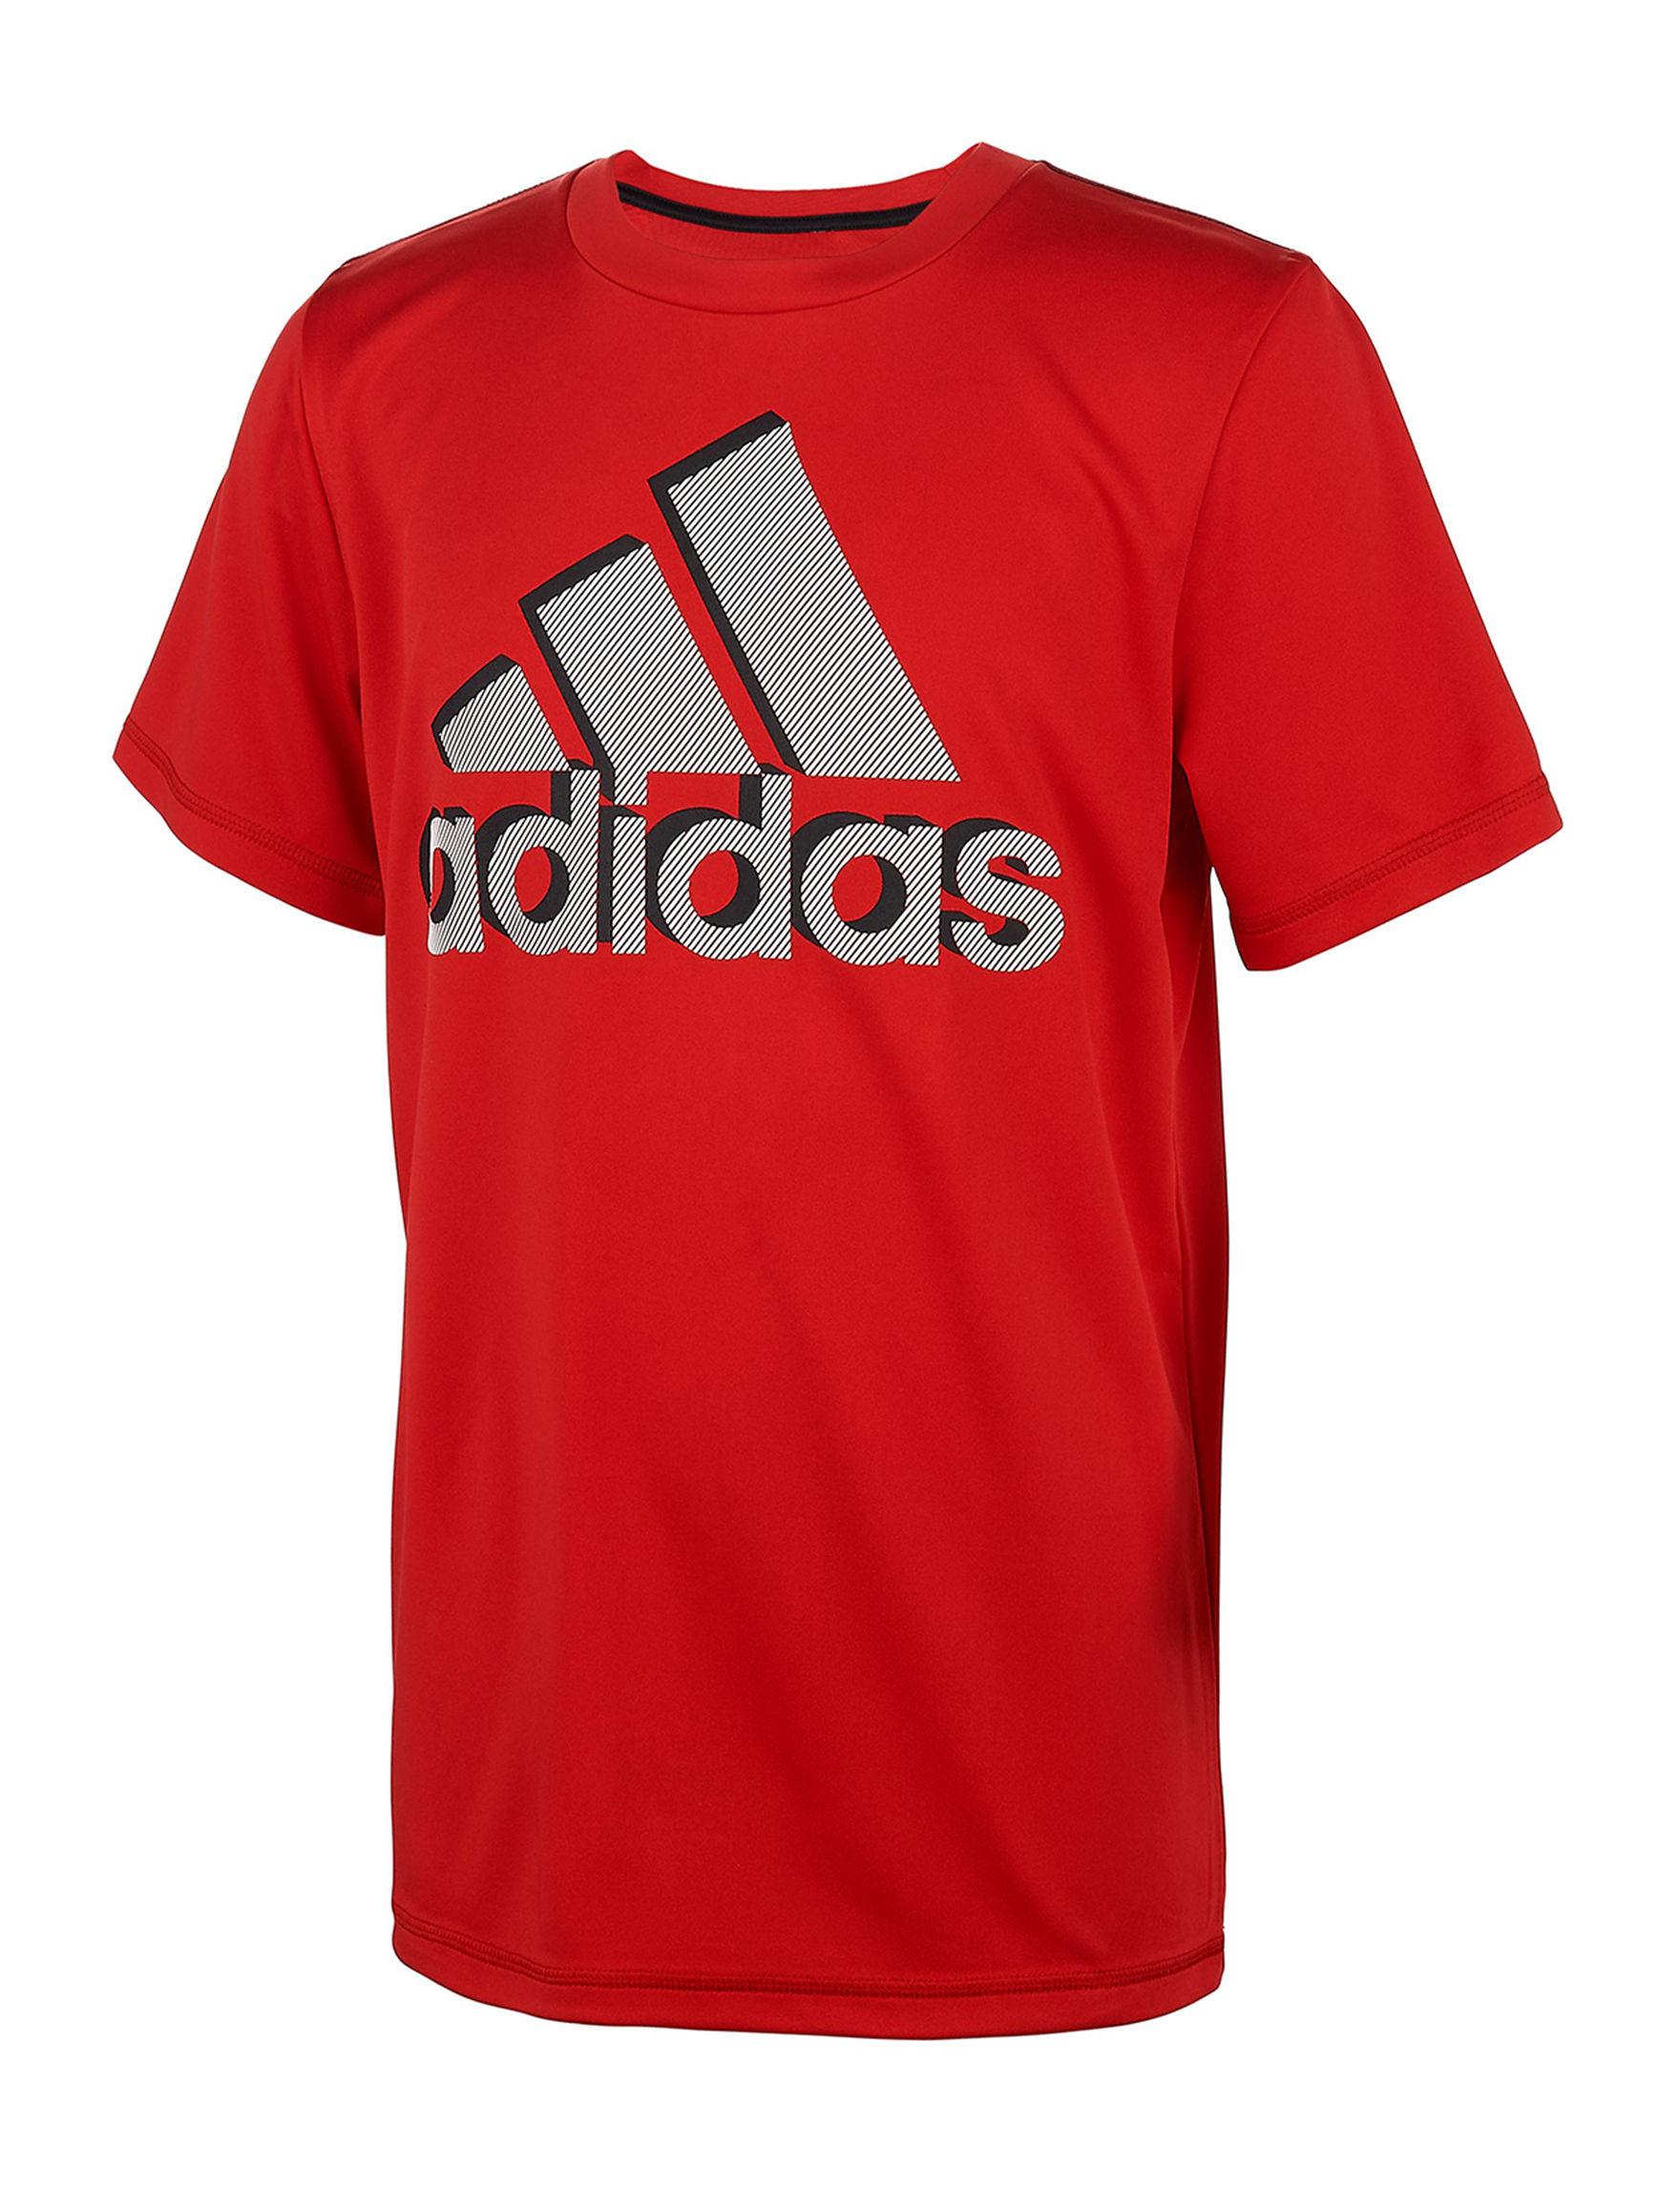 Adidas Red / Black / White Tees & Tanks